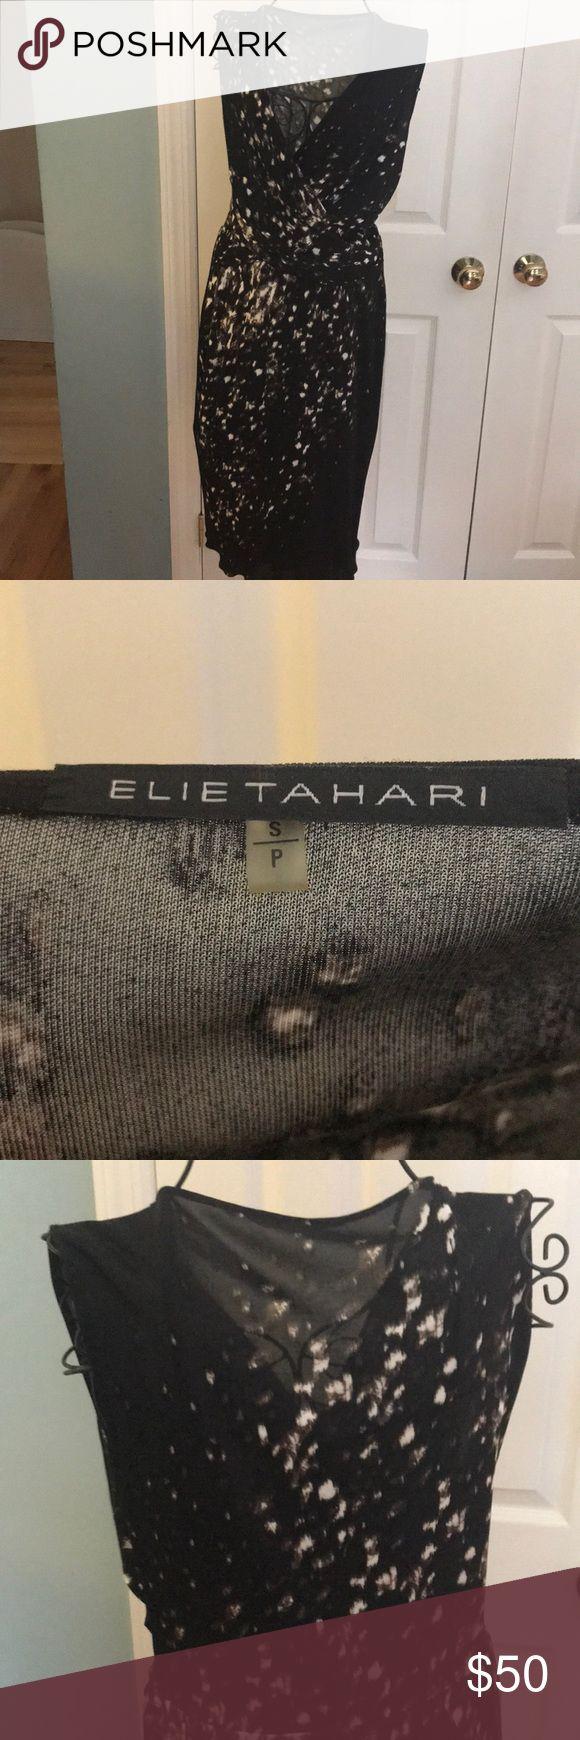 Elie Tahari  dress. Stretch slip on size S Elie Tahari slip on stretch dress. Viscose rayon. Soft. Black, brown, cream random pattern. Size Small Elie Tahari Dresses